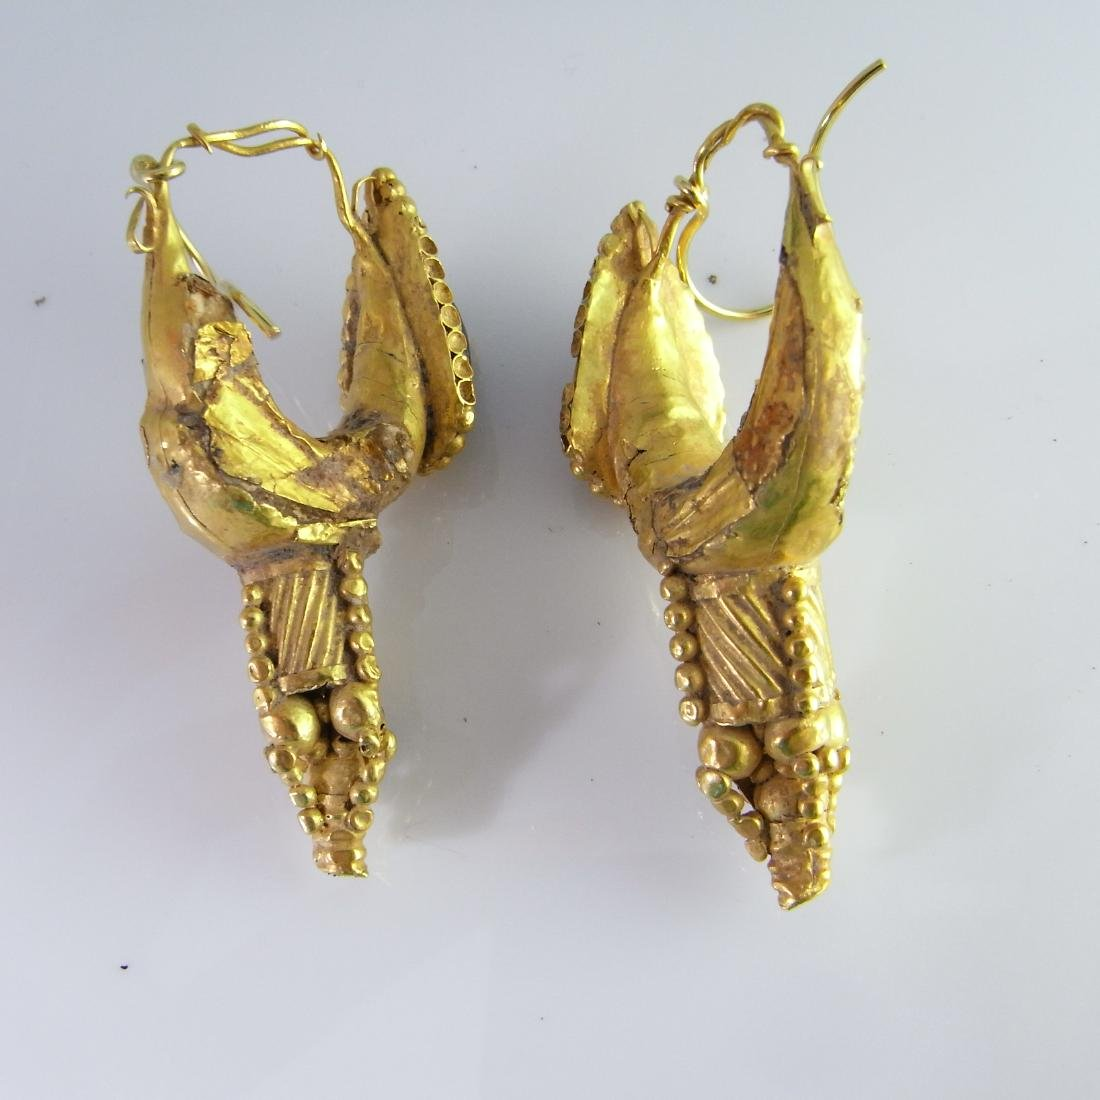 LARGE ANCIENT ROMAN GARNET GOLD EARRINGS 4TH C AD - 5